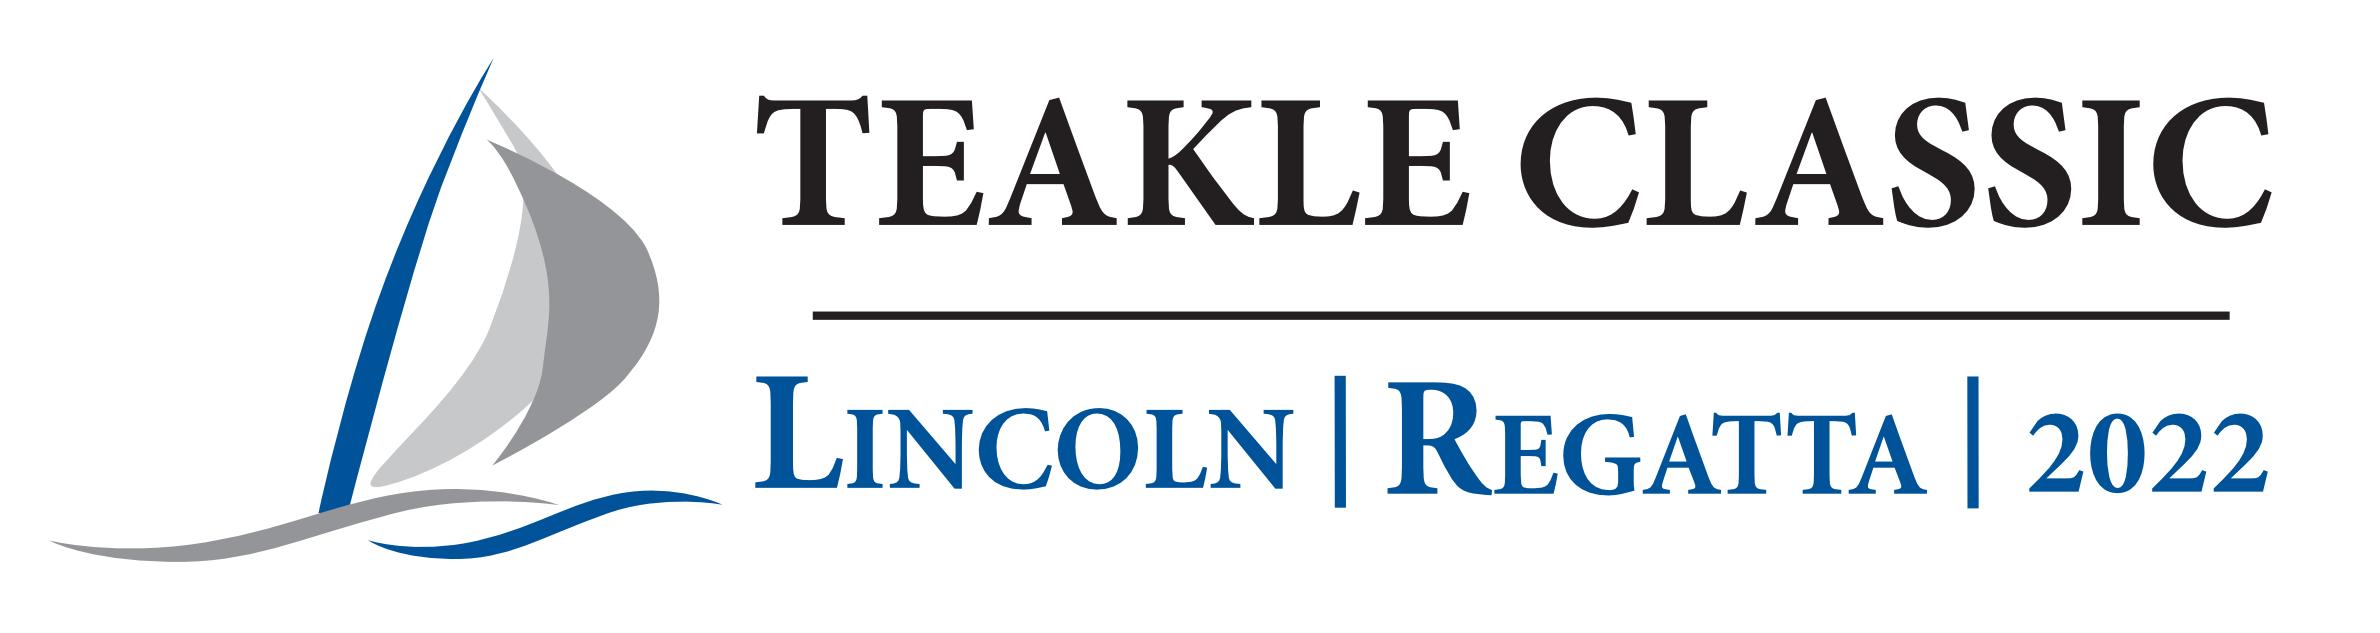 Lincoln Week Regatta 2022